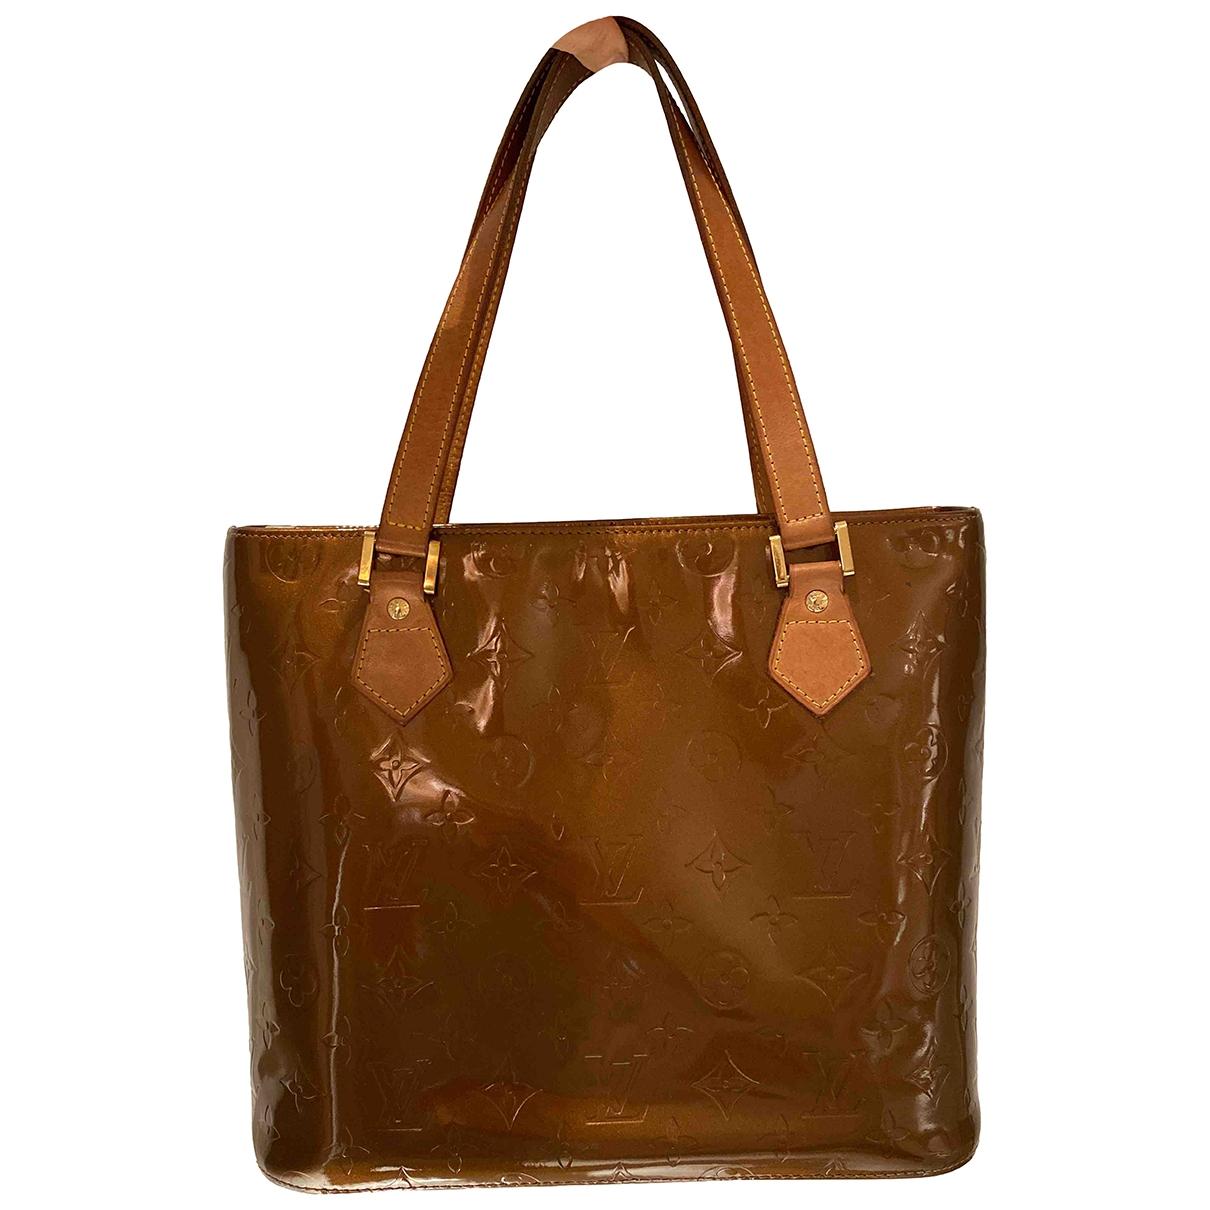 Louis Vuitton Houston Camel Patent leather handbag for Women \N